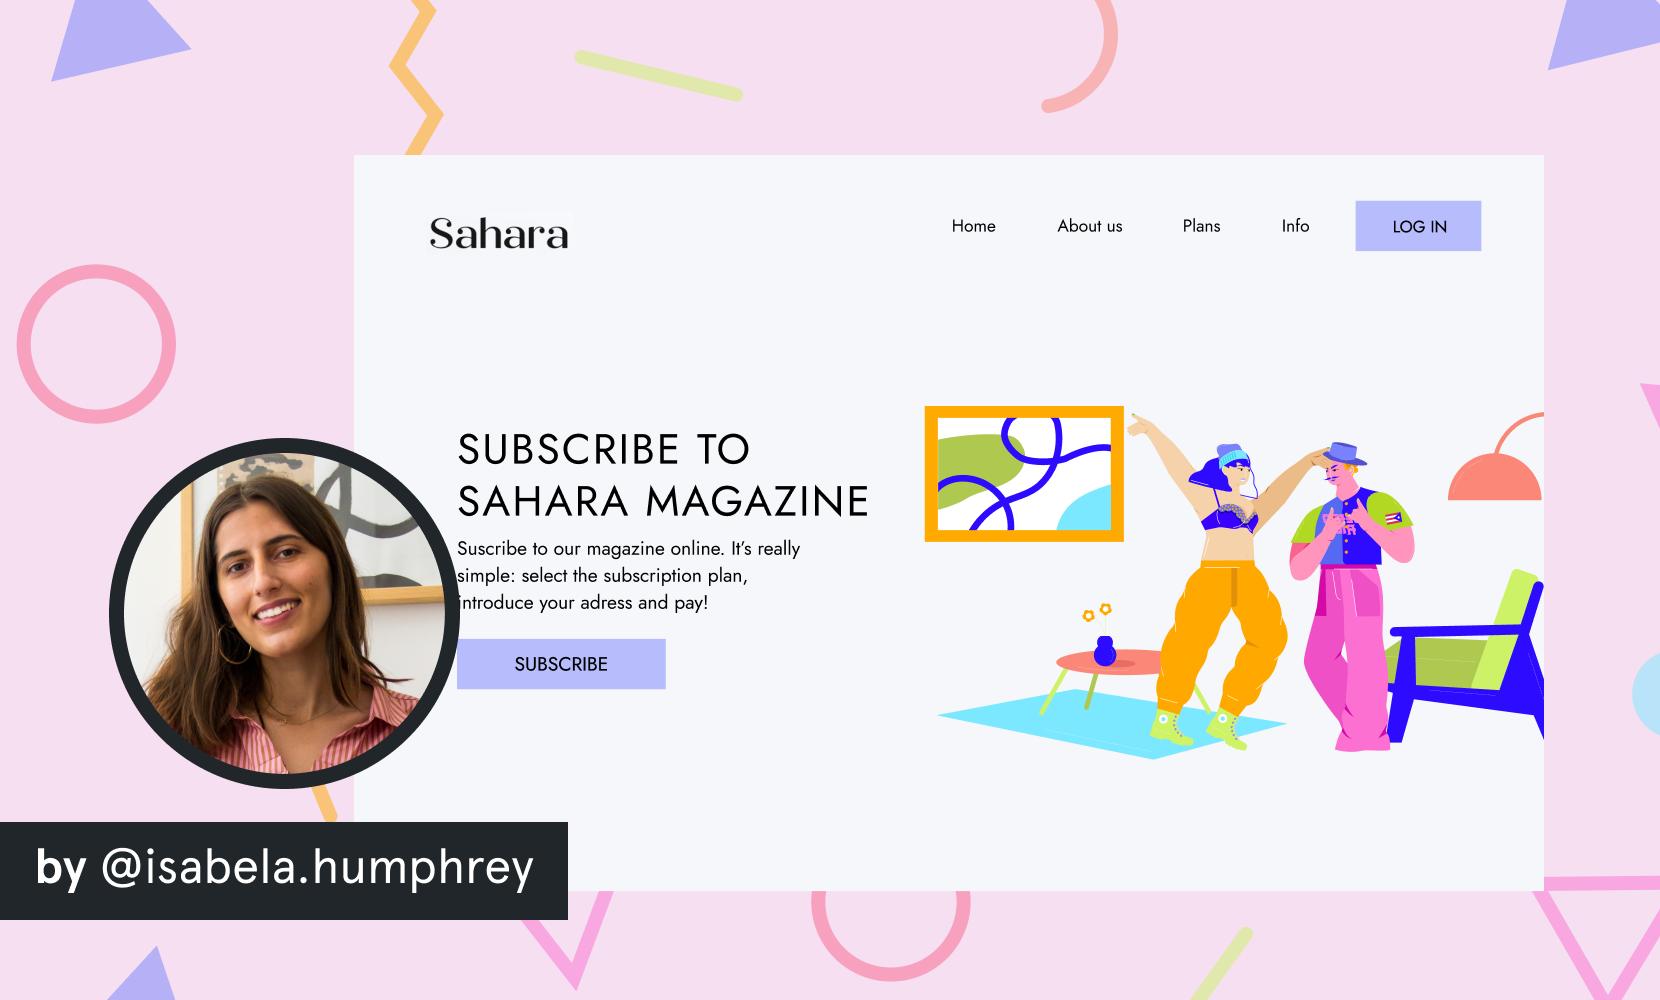 https://blush.design/collections/power-moves?utm_source=blog&utm_medium=blog&utm_campaign=10-free-illustrations